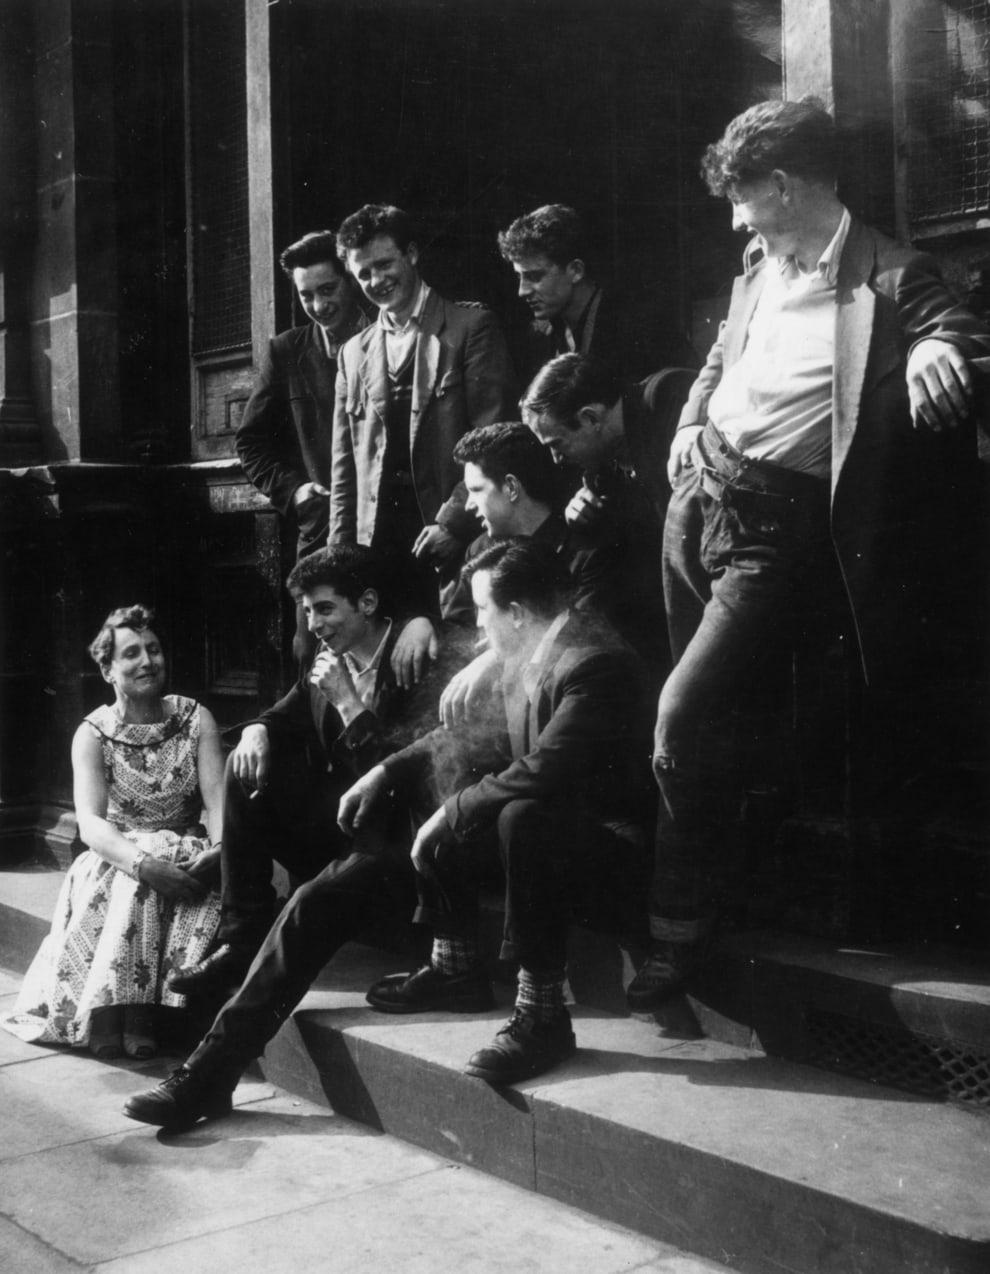 '50s Teds.Photo: Keystone/Stringer/Getty